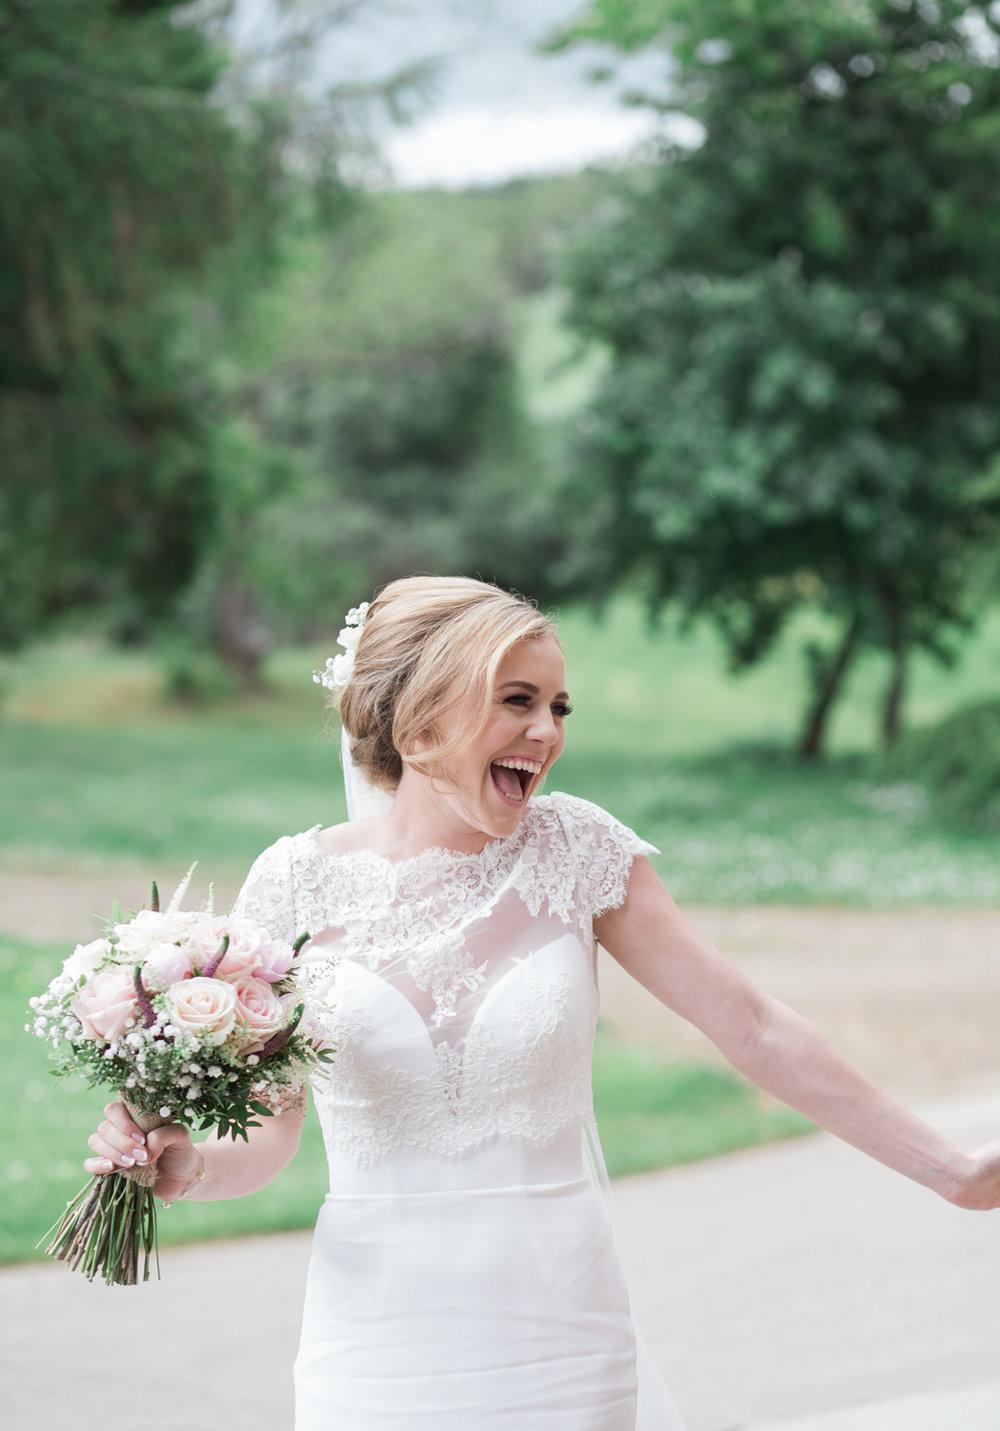 suzanne neville wedding dress, Suzanne neville bridal gowns, wedding dress aberdeen, perfect bridal rooms, aswanley wedding, aswanley